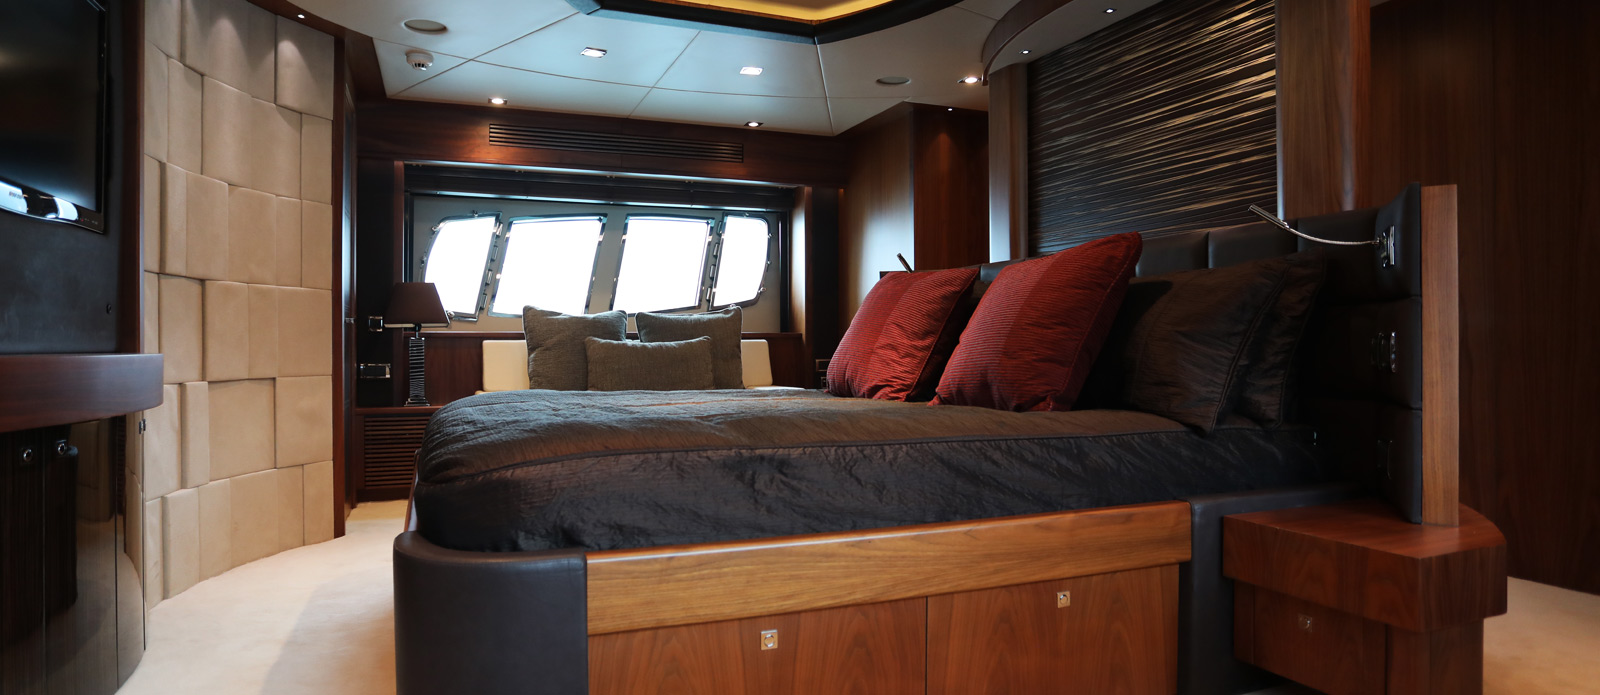 Sunseeker-30-Metre-Yacht-Coraysa-Master-Cabin-2